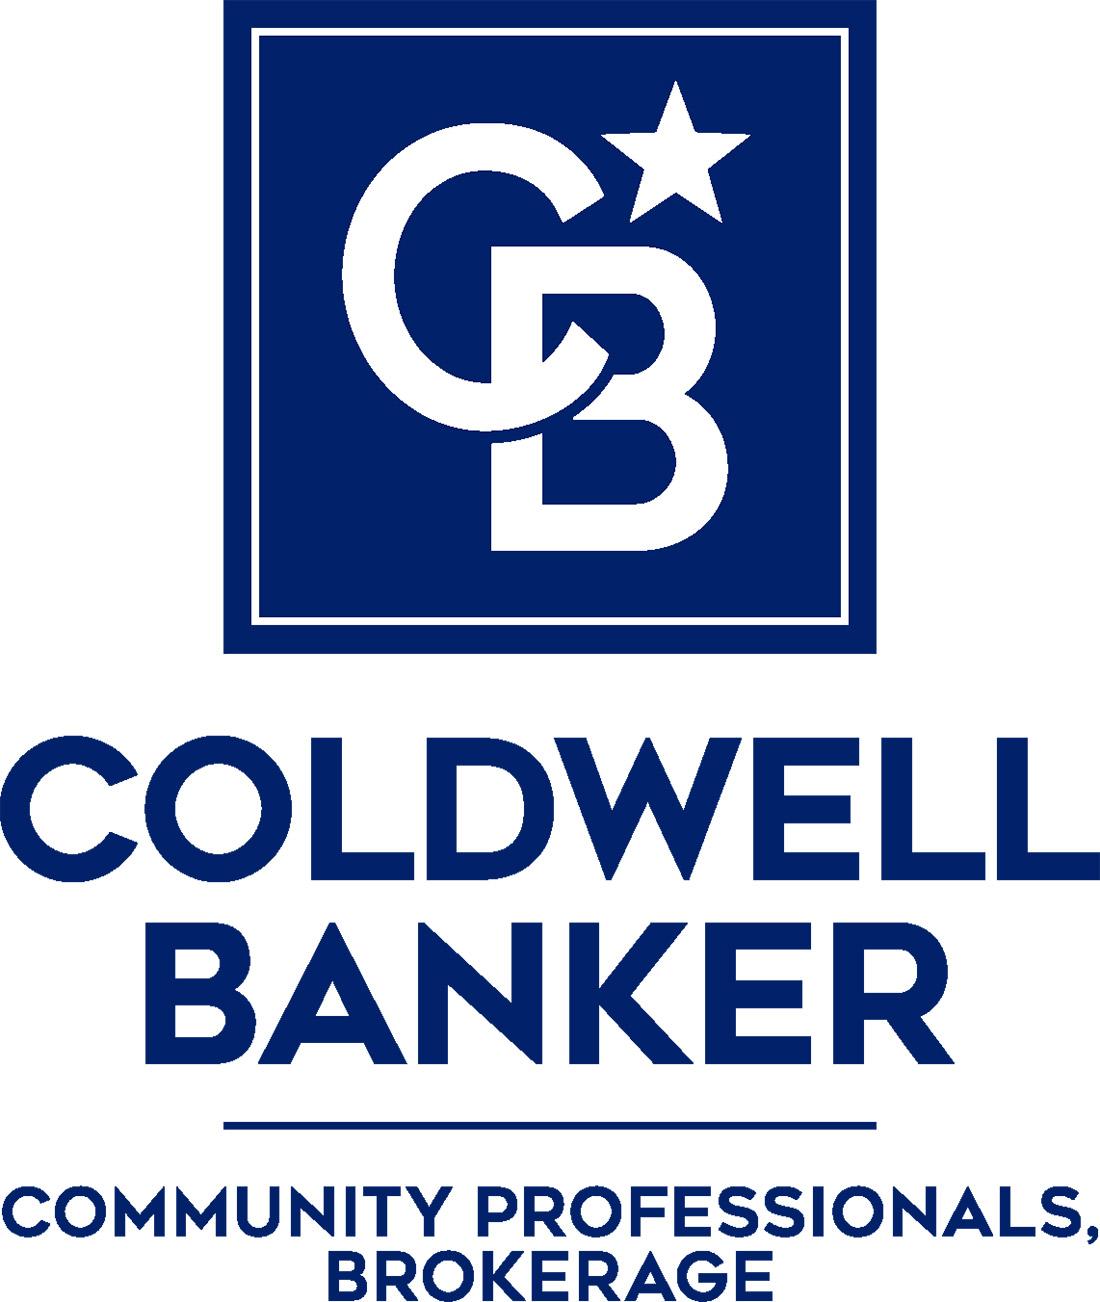 Gary Herron - Coldwell Banker Community Professionals Logo